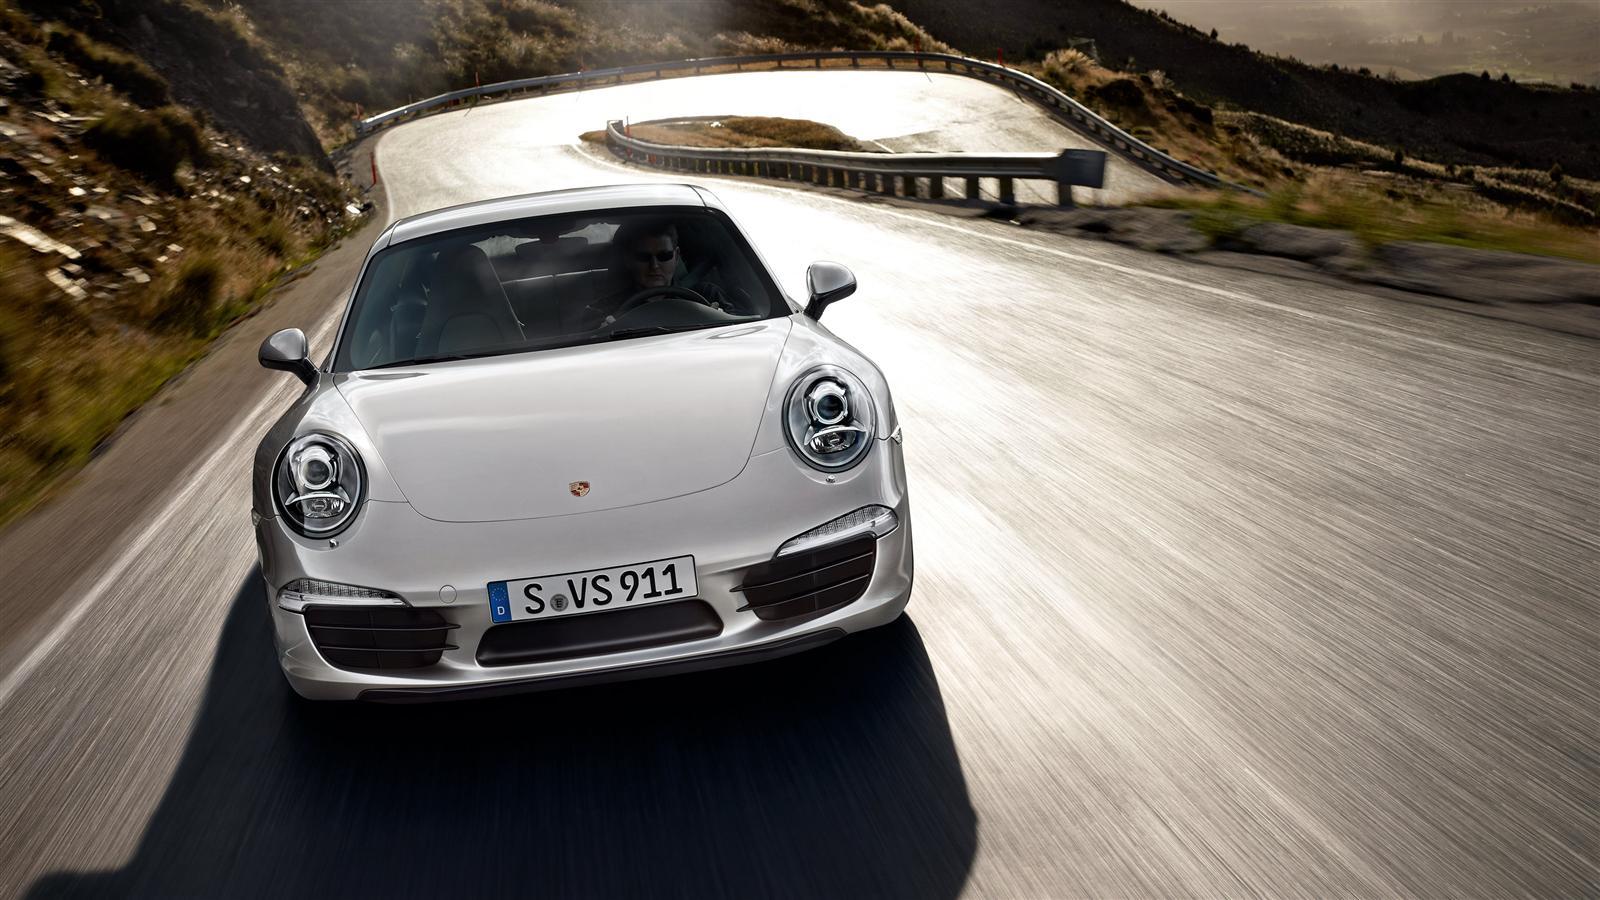 Porsche 911 Carrera /usite/1132/images/911_gal6.jpg